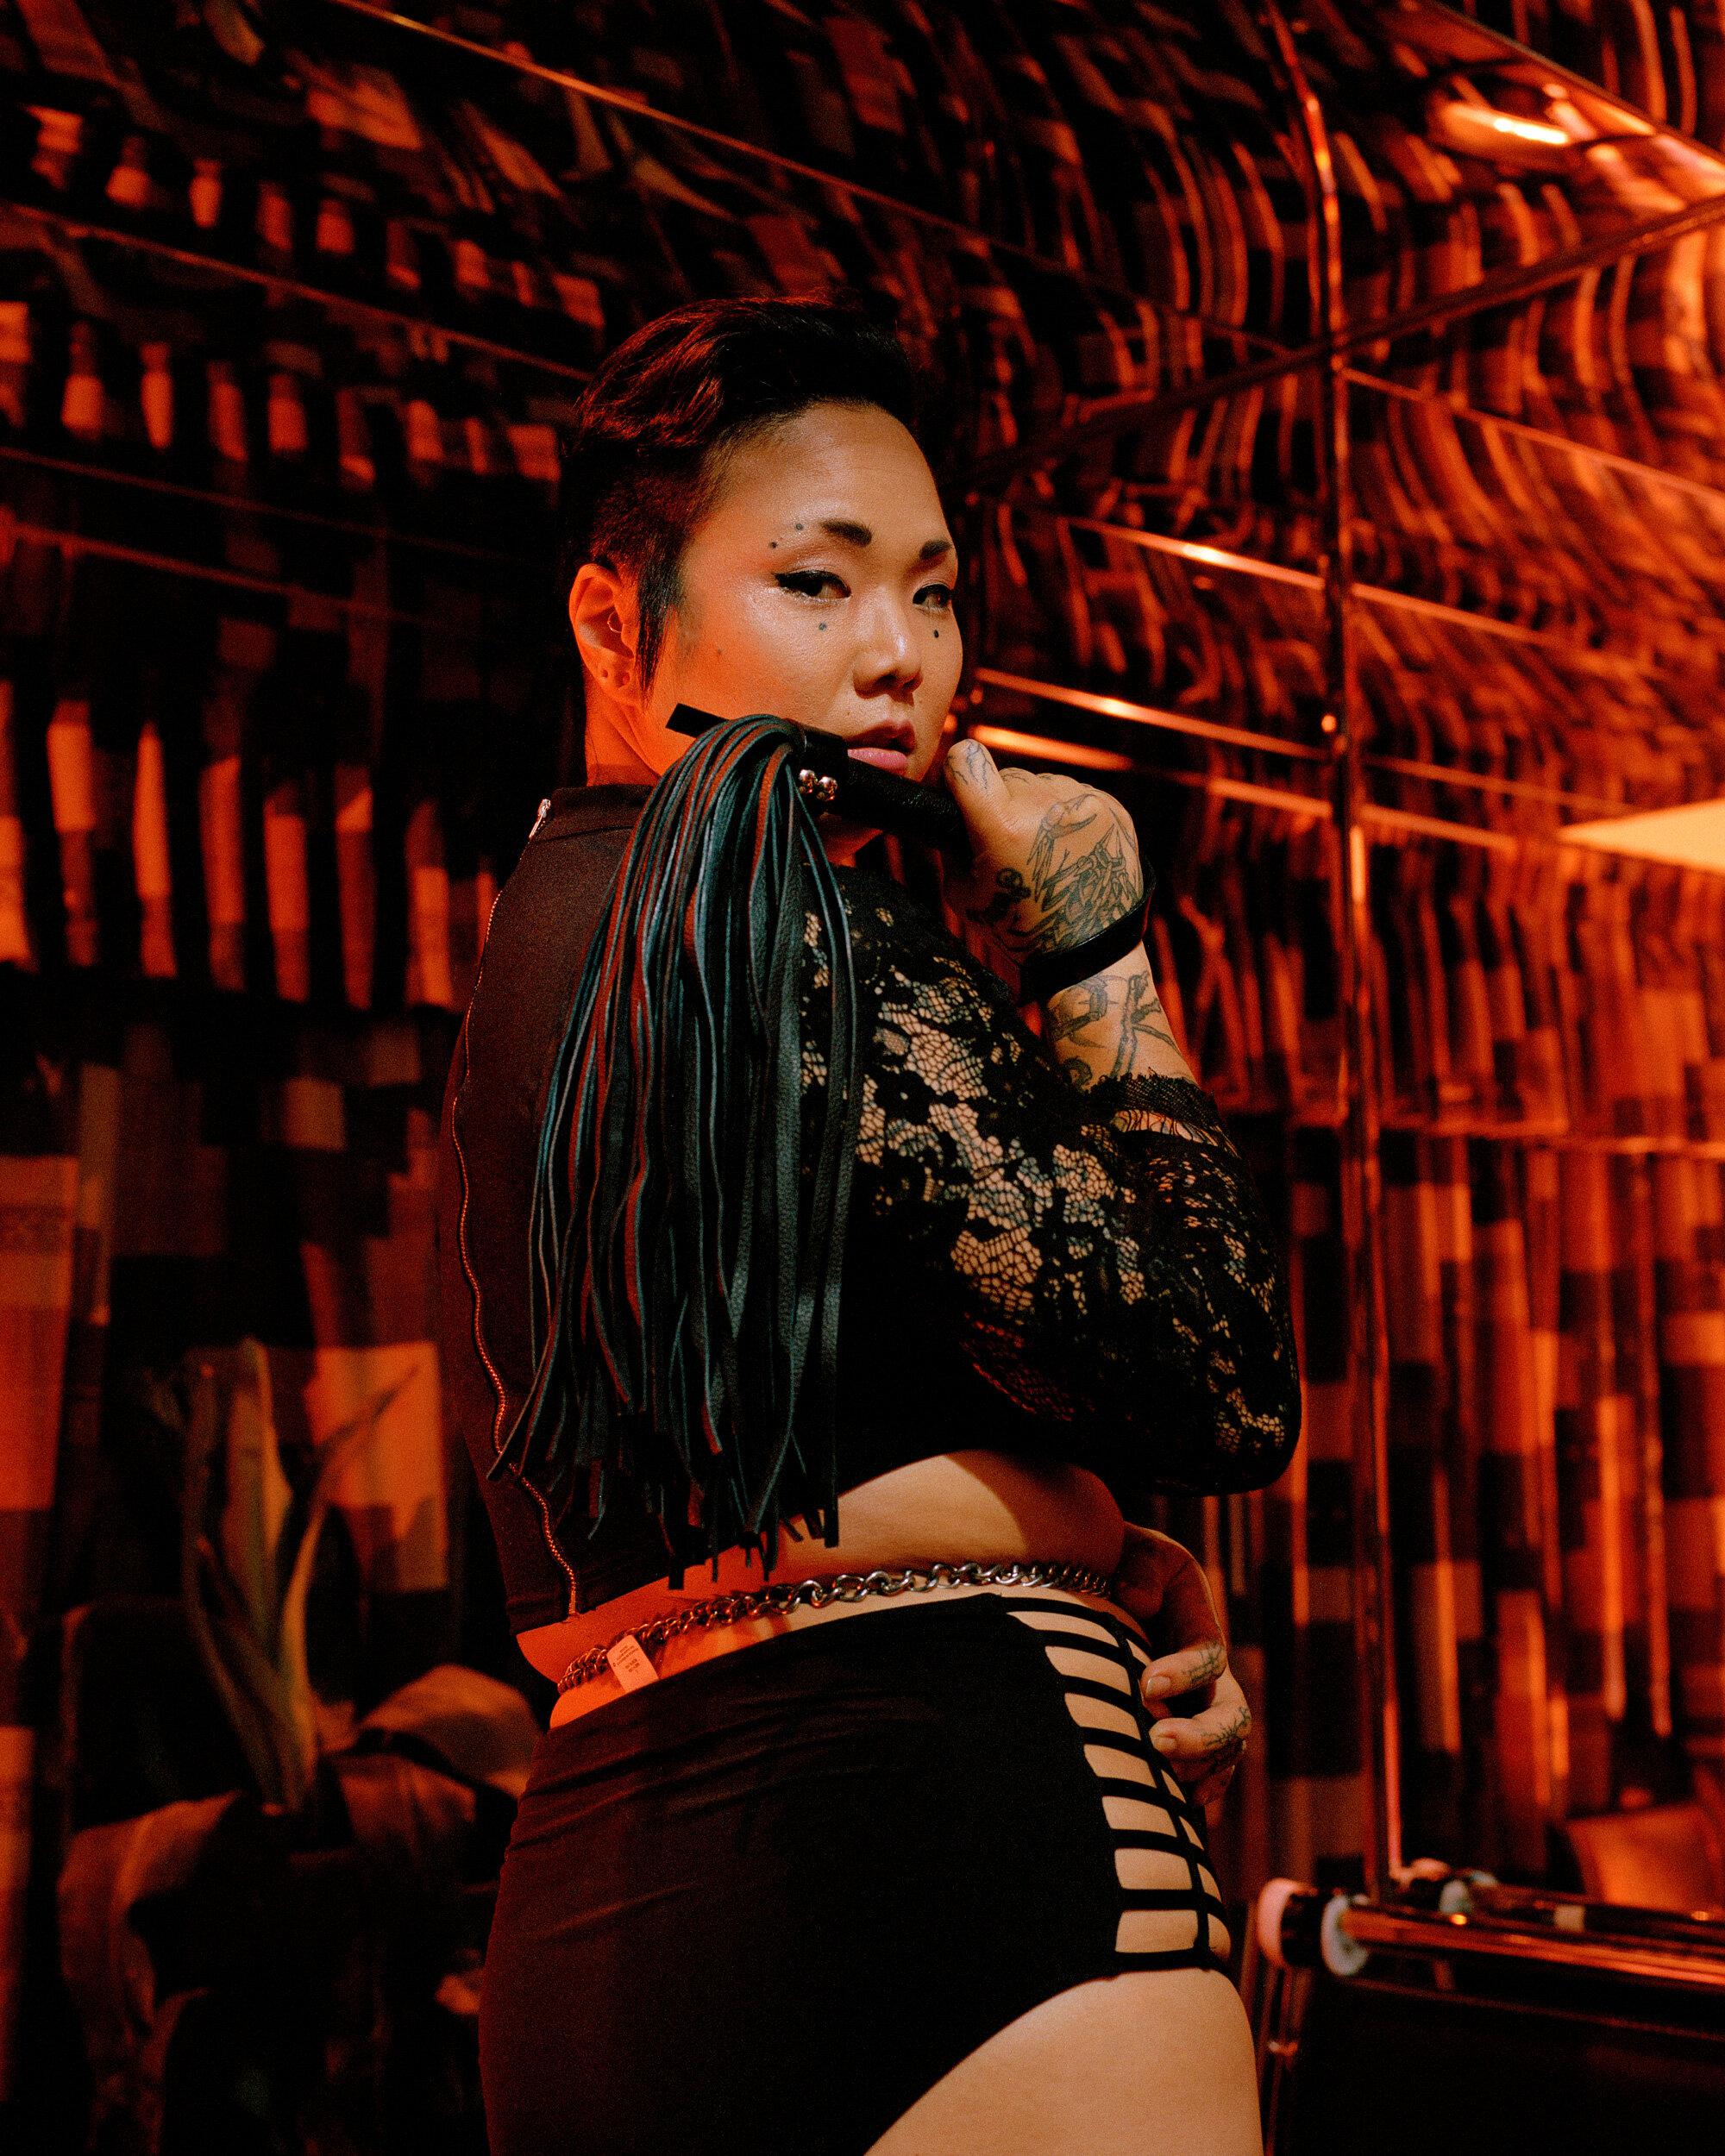 jin-hee-dominajia-006.jpg